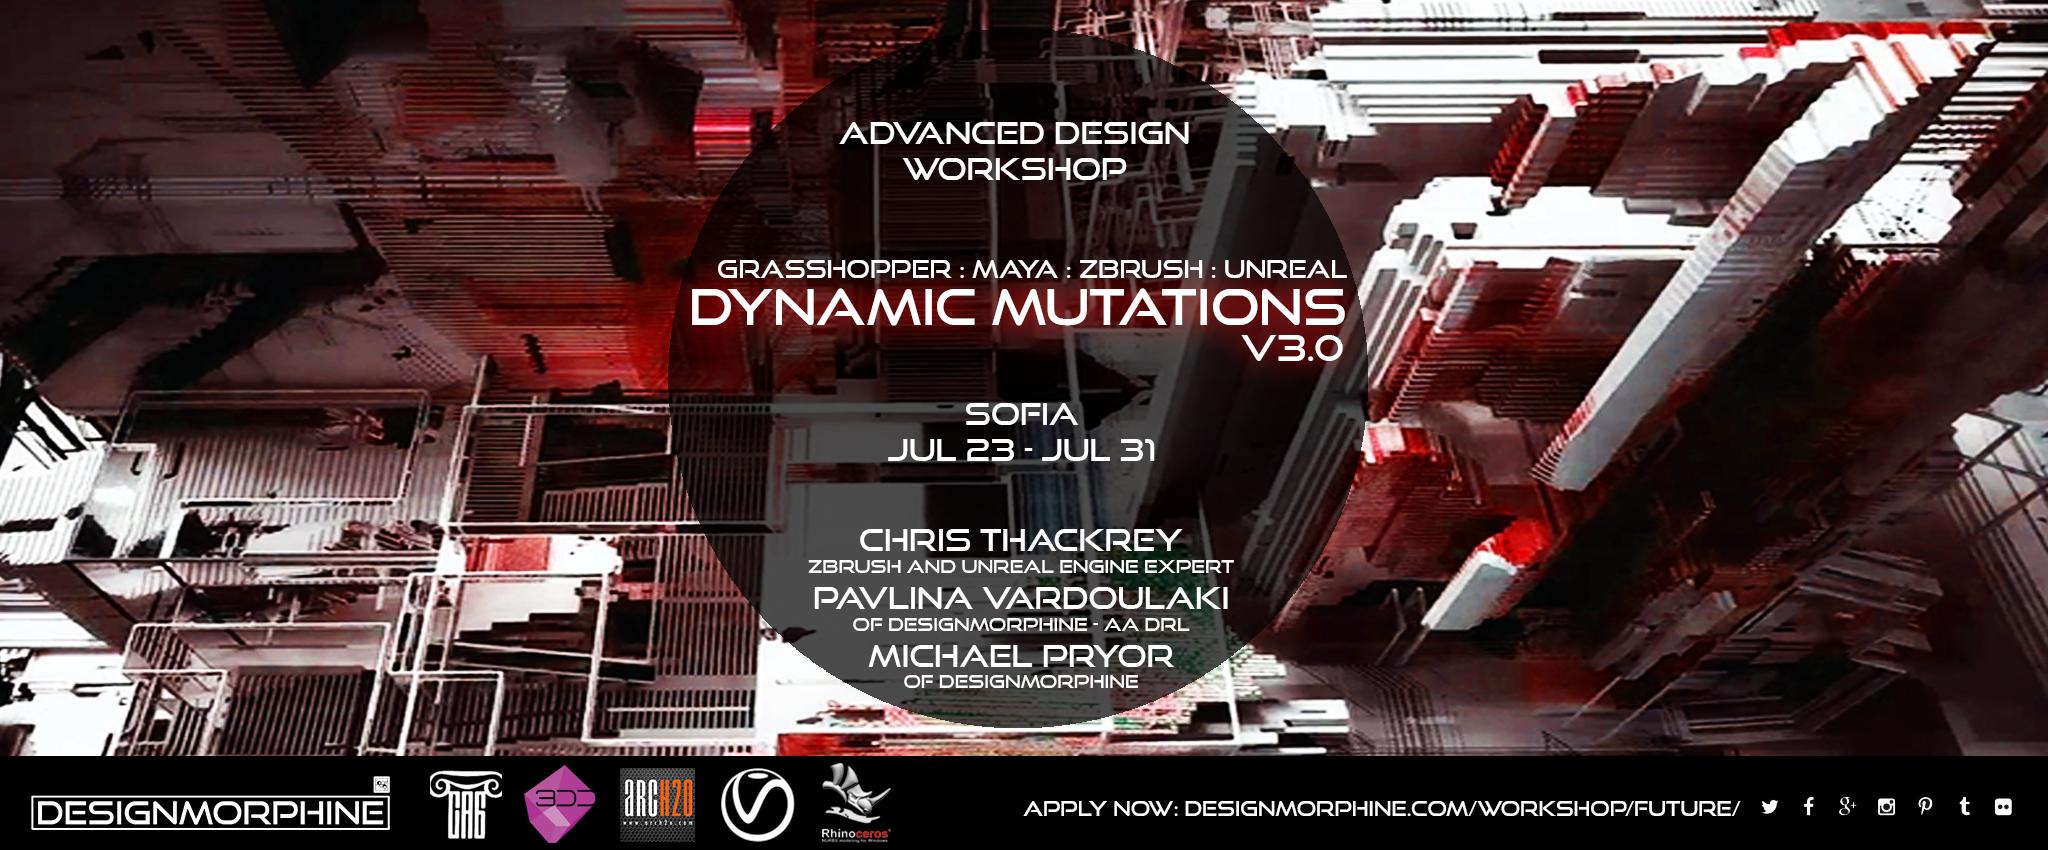 2016_Dynamic Mutations Workshop v3